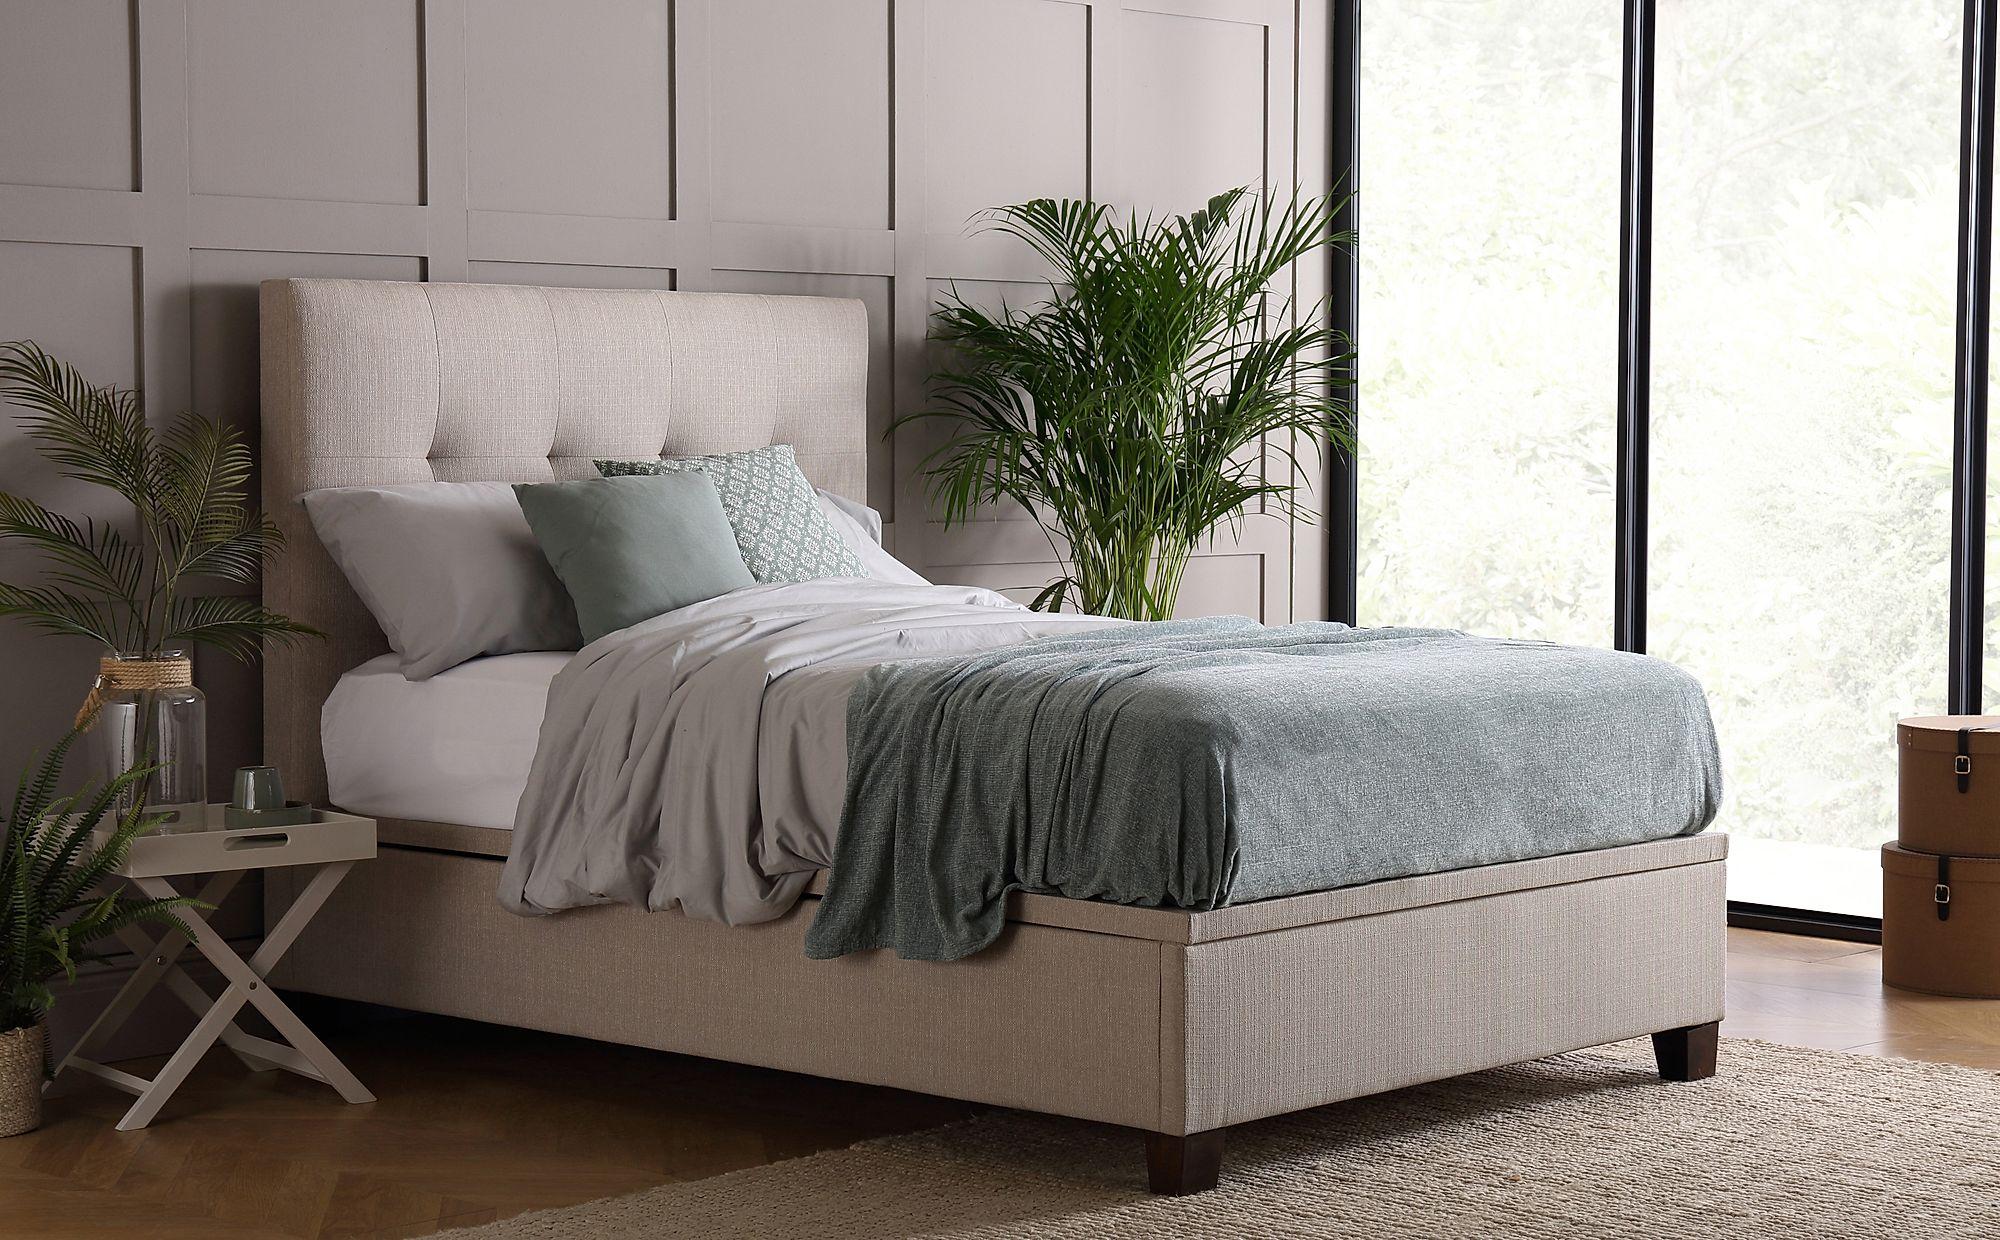 Fabulous Kaydian Walkworth Linen Fabric Ottoman Storage Bed Double Ibusinesslaw Wood Chair Design Ideas Ibusinesslaworg